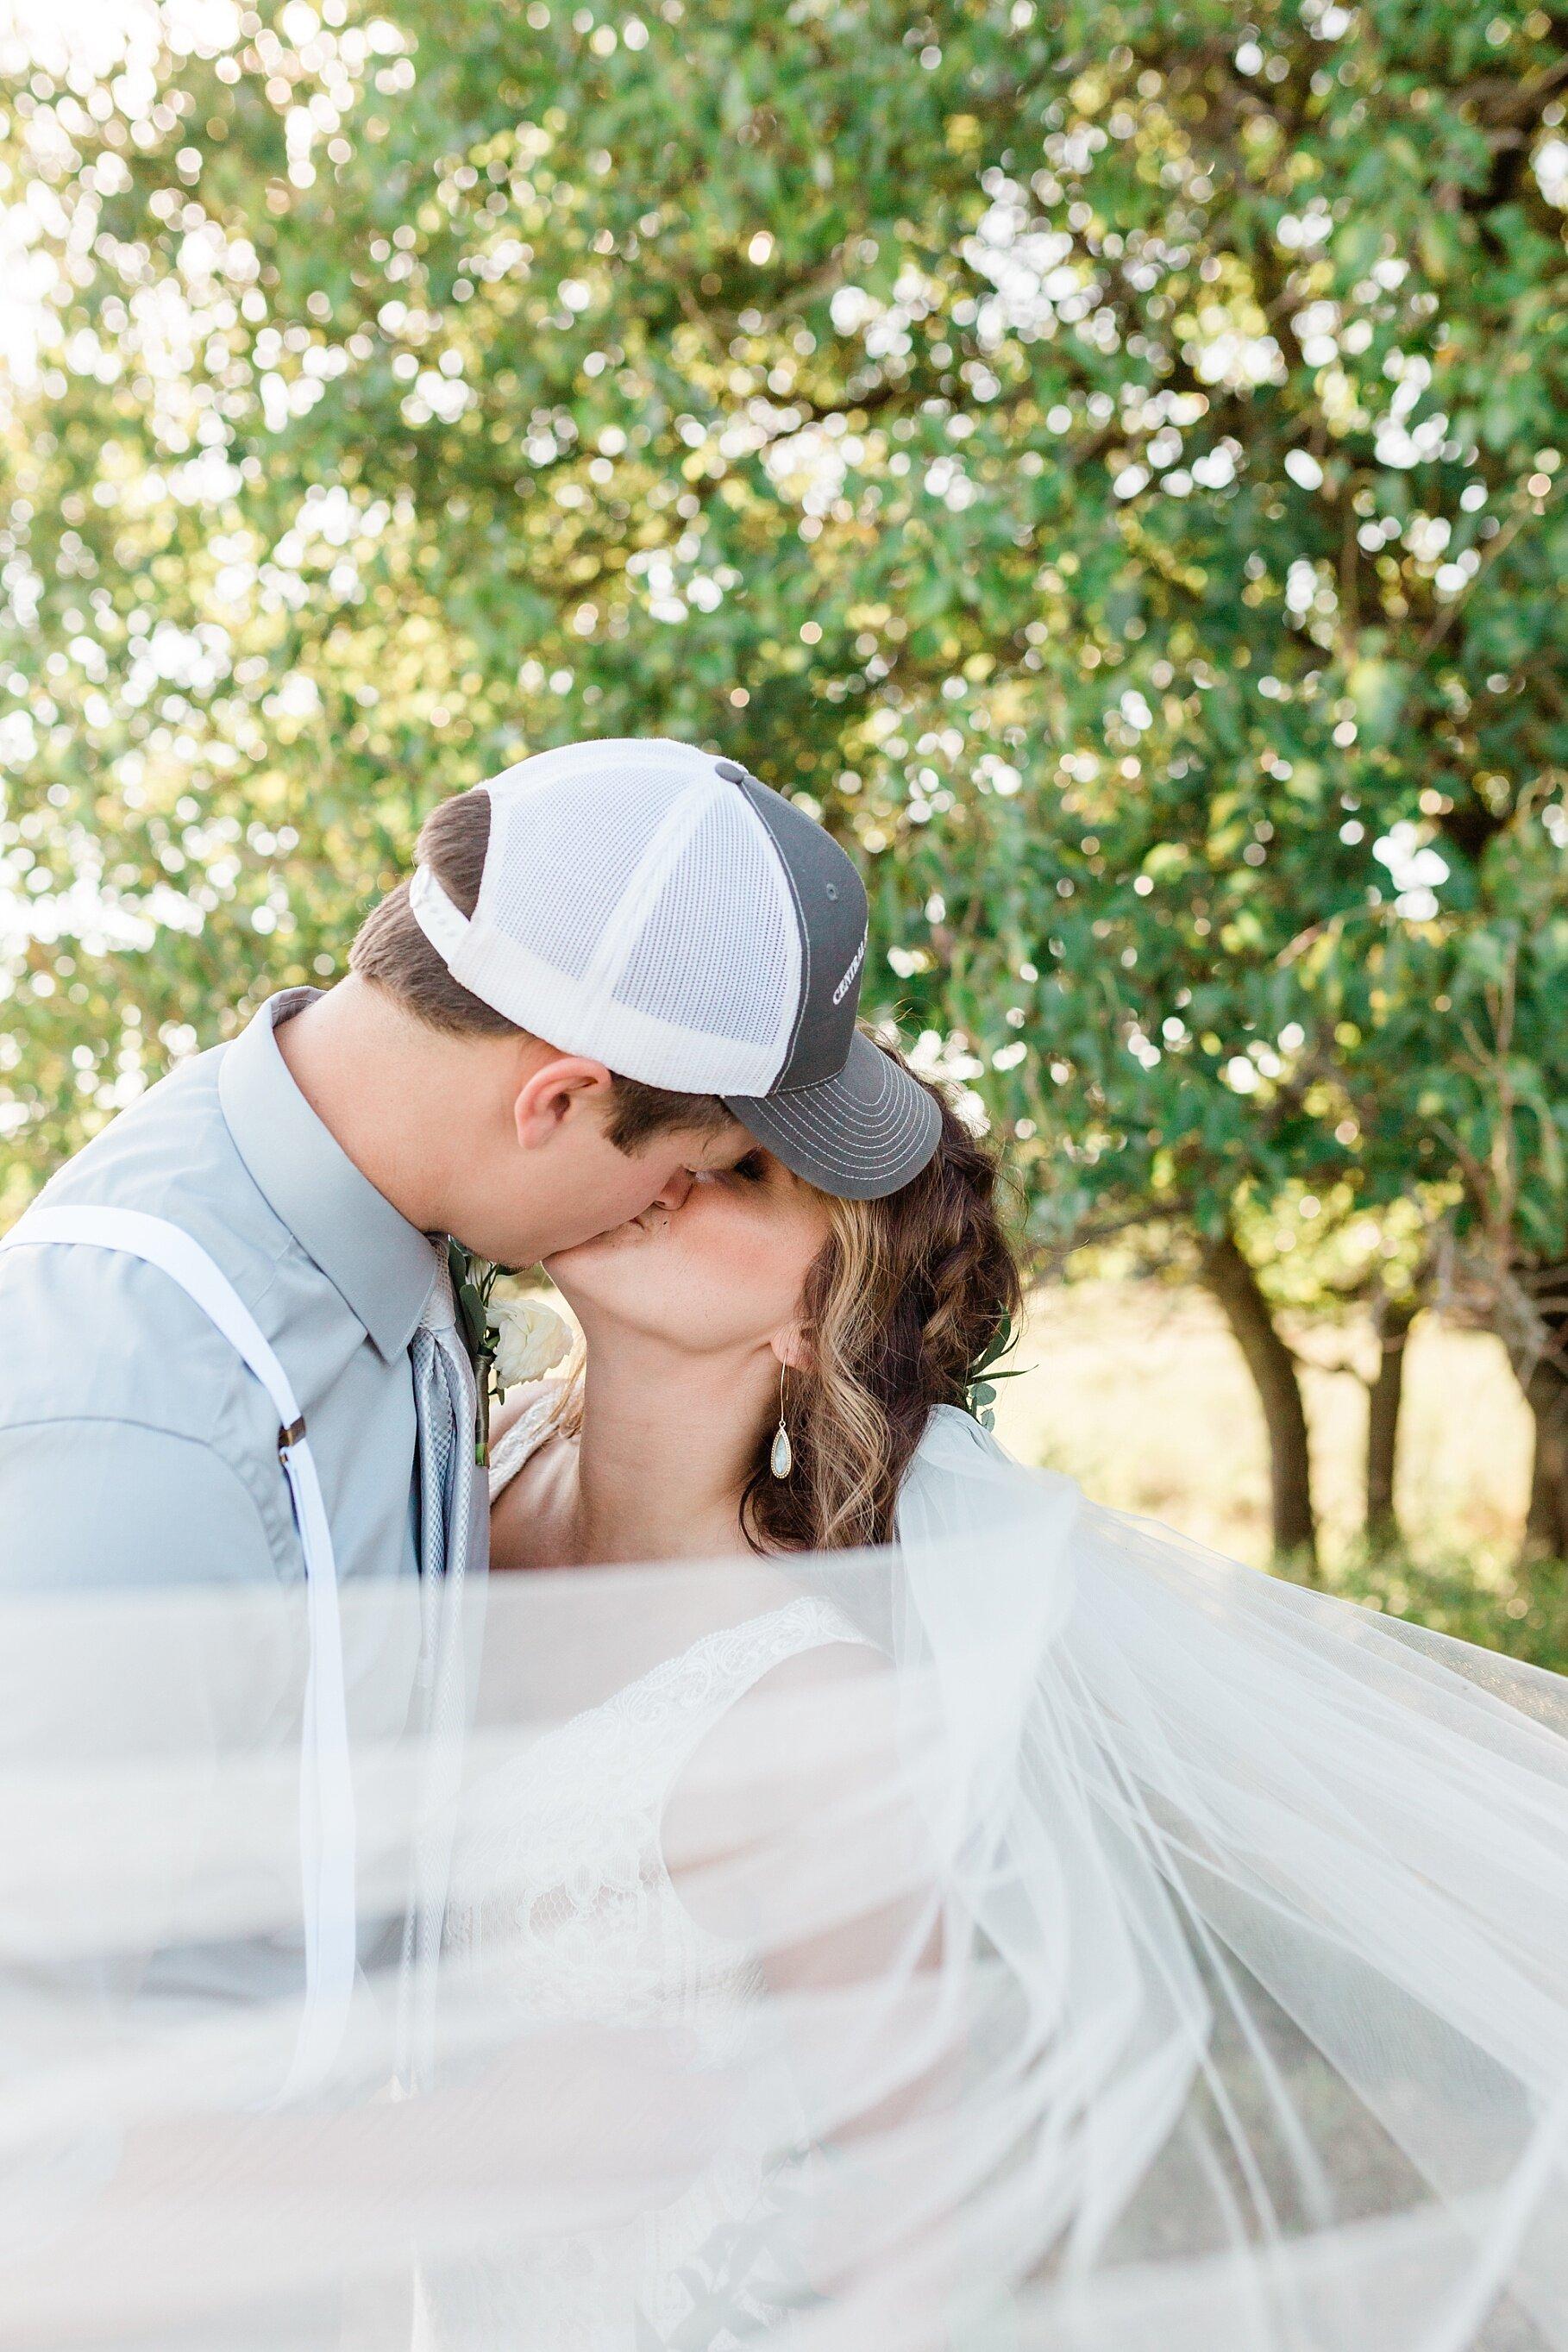 Earth-Toned Wedding by KKP Associate Wedding Photographer and Kelsi Kliethermes Photography Best Columbia Missouri Wedding Photographer_0038.jpg